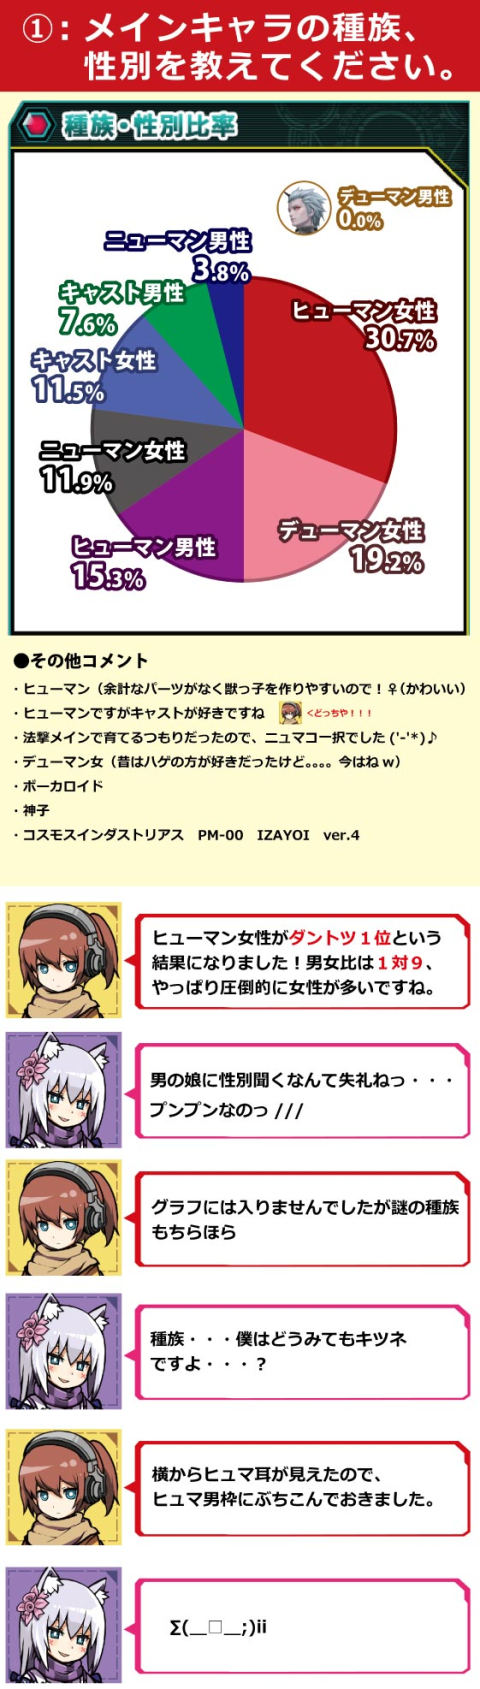 パーチ調査報告書2-01